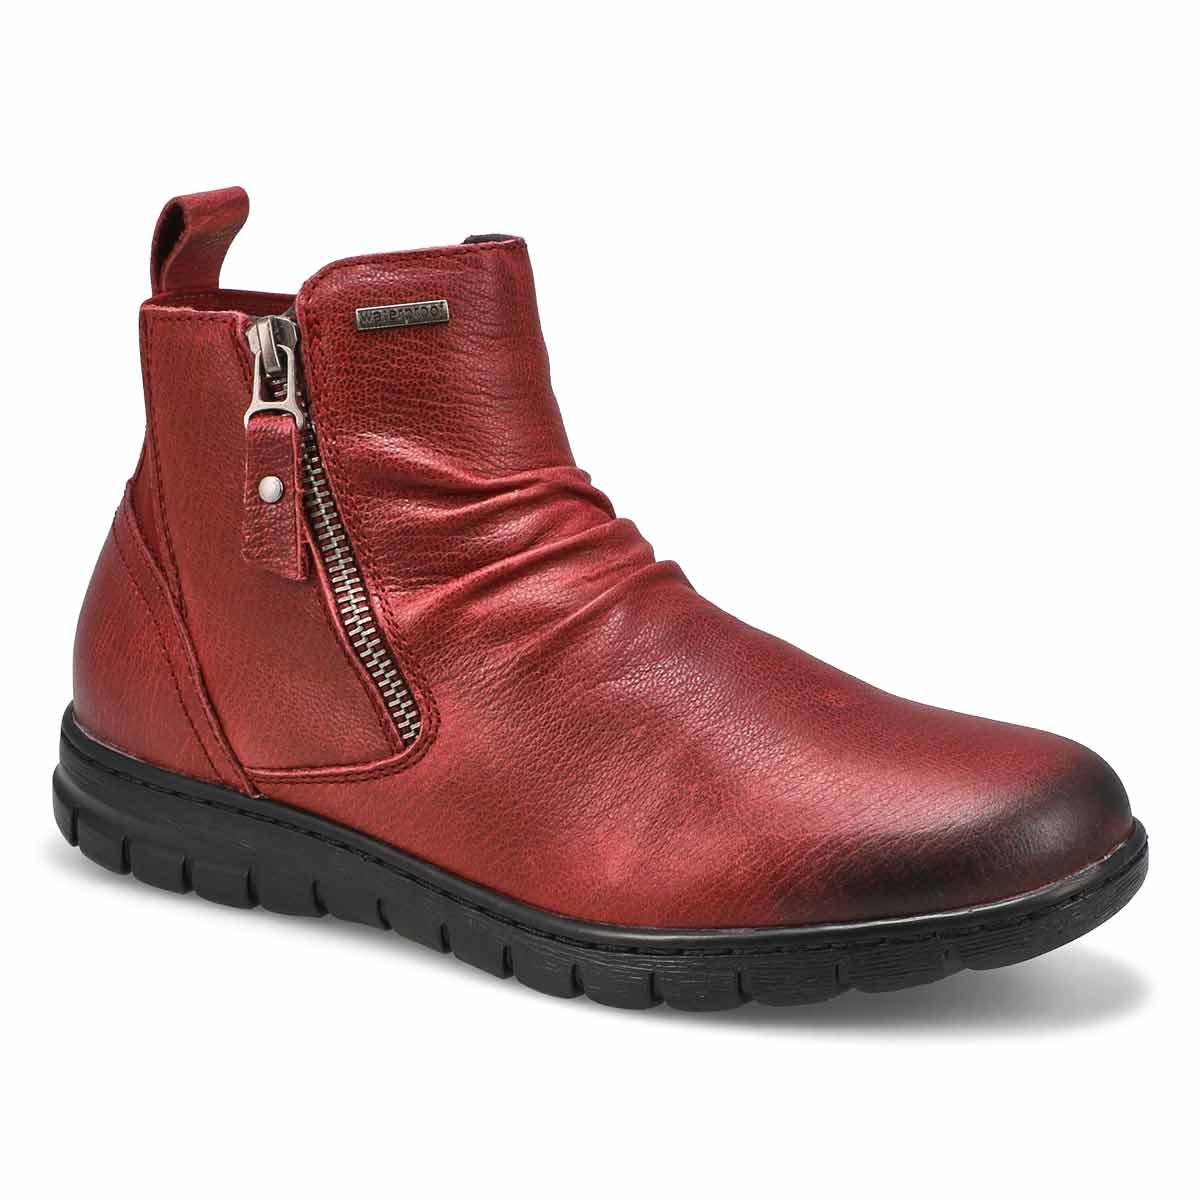 Women's Steffi 71 Waterproof Ankle Boot - Burgandy